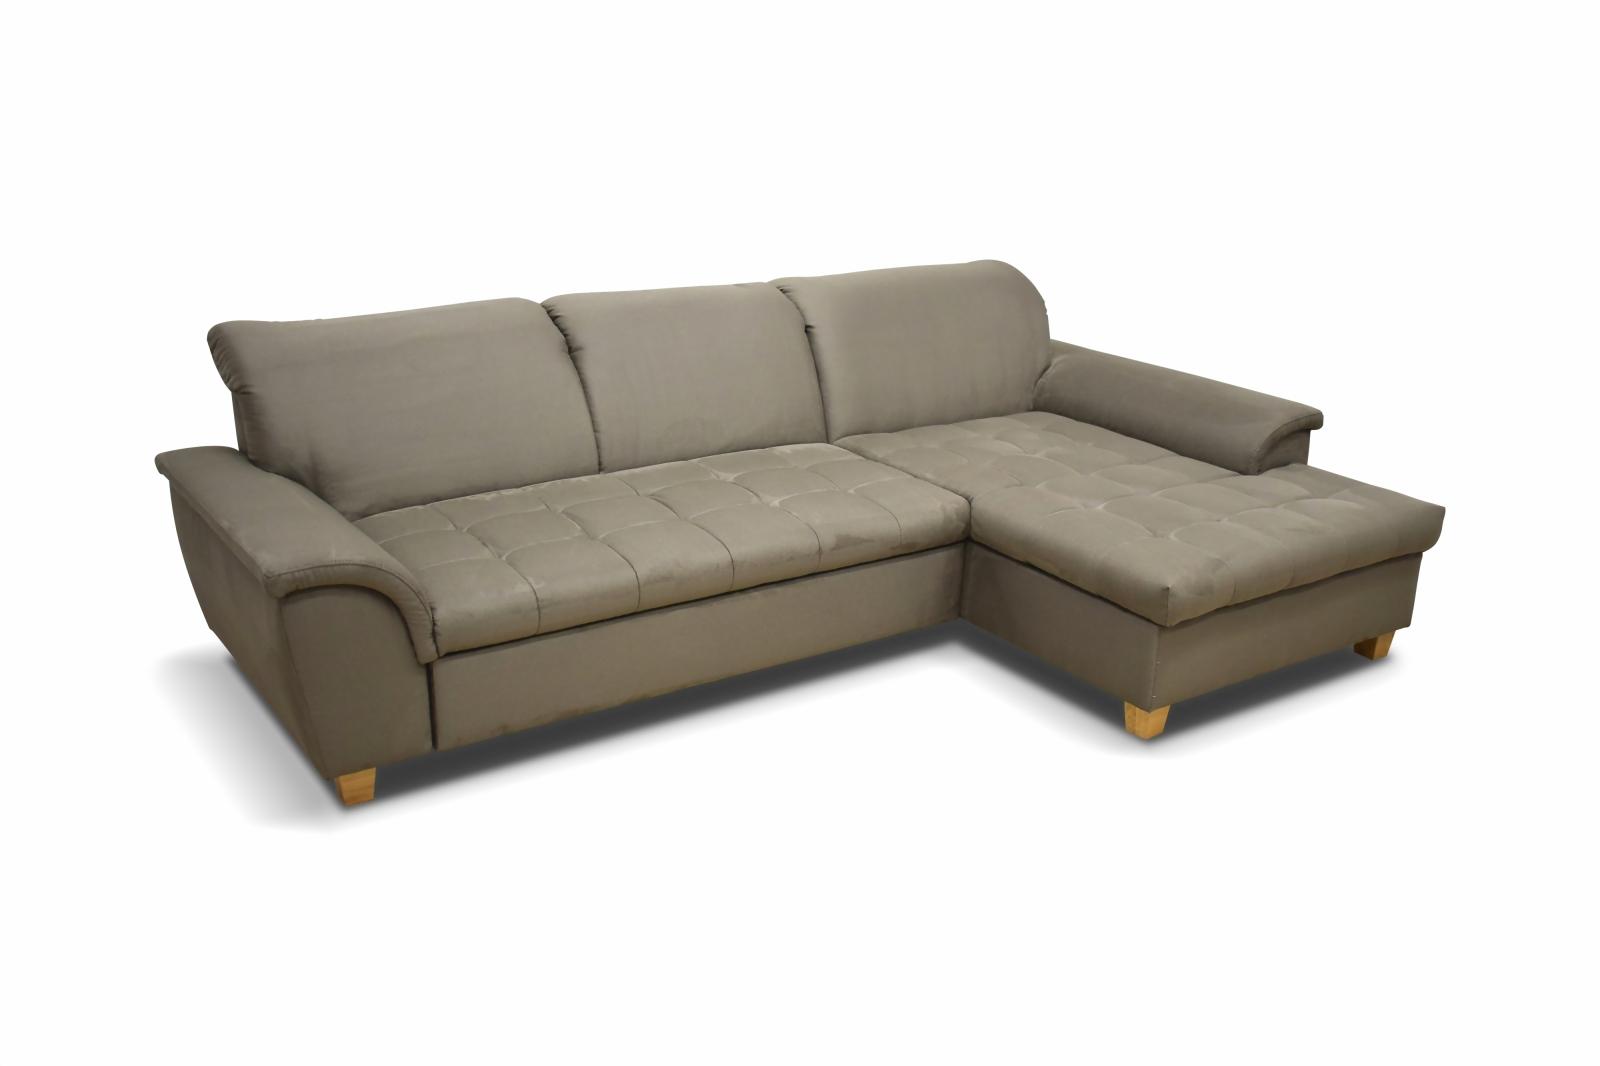 Full Size of Ikea Ektorp 3er Sofa Mit Recamiere Bezug Links Ecksofa Und Schlaffunktion 200 Cm Klein Ledersofa Rechts Braun Kivik 2er Relaxfunktion Schwarz Bettfunktion Samt Sofa Sofa Mit Recamiere